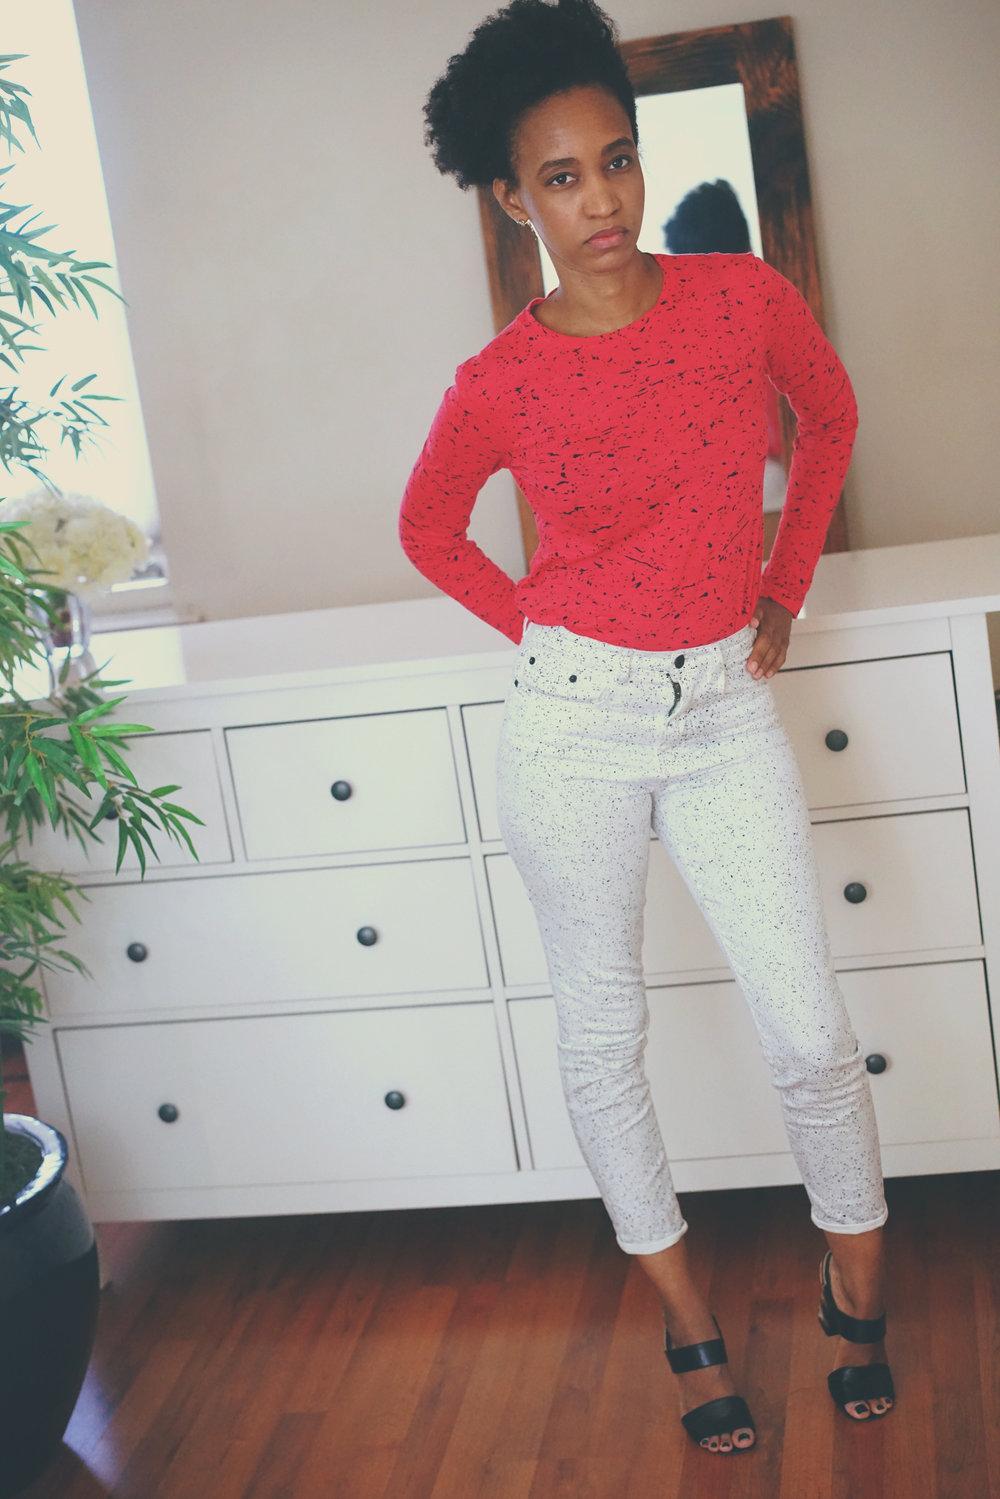 Christine_the_style_d'affaire_proenza_schouler_designer_jeans_white_black_sophistication_fashion_forward_editorial_shirt_trend_fall_summer_nordstrom_hautelook_delman_shoes_mood.jpg